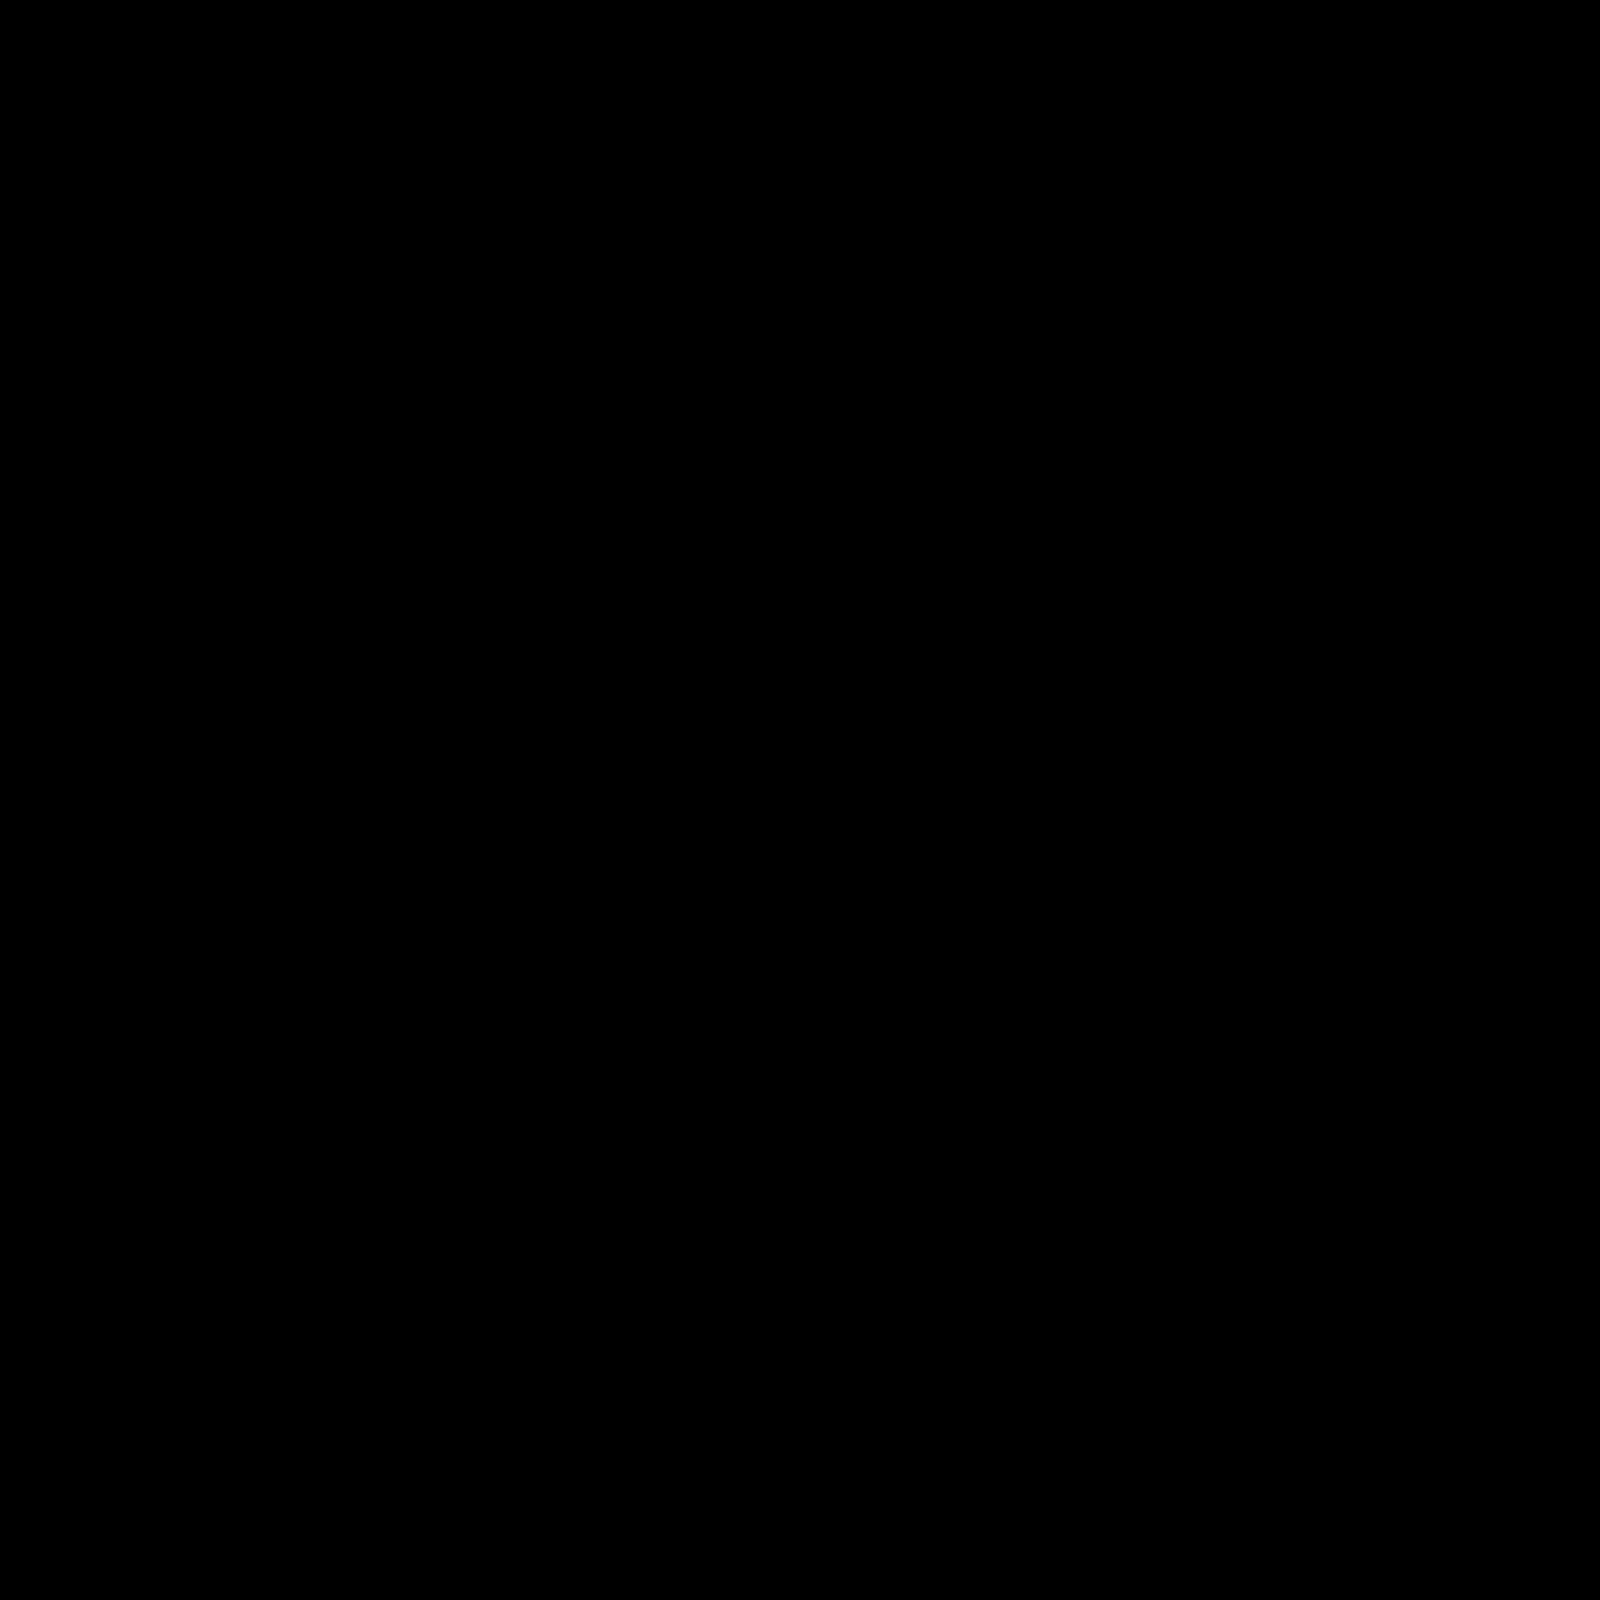 Yin Yang Israel American SVG Clip arts